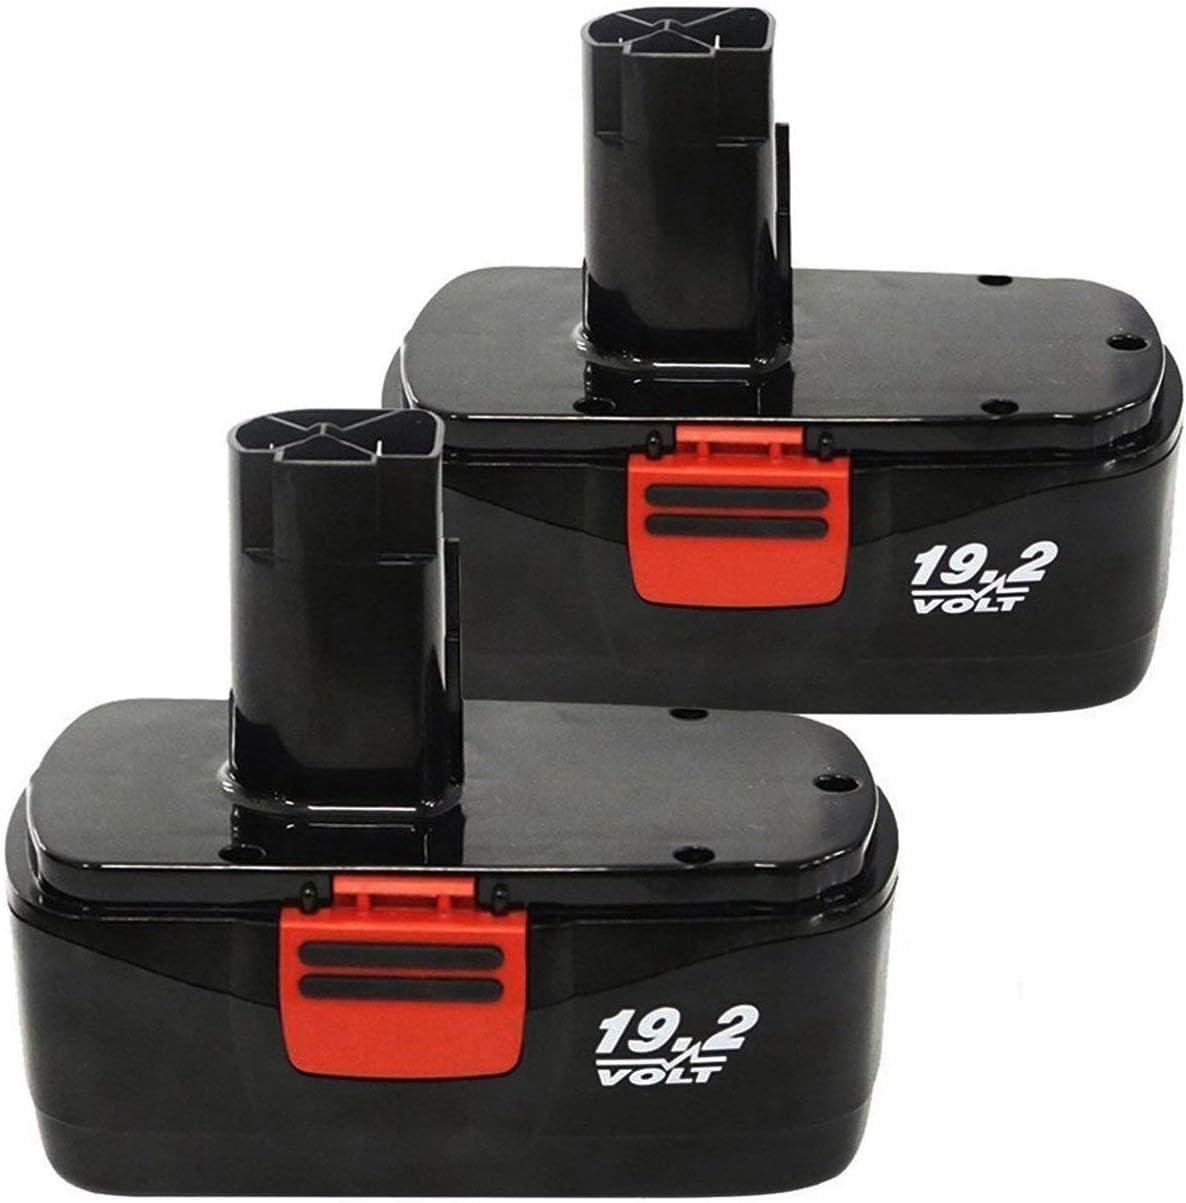 Enegitech 2 Pack 19.2V 3.0Ah C3 Replacement Battery for Craftsman DieHard C3 315.115410, 315.11485, 315.114852, 130279005, 11375, 11376, 11045, 1323903